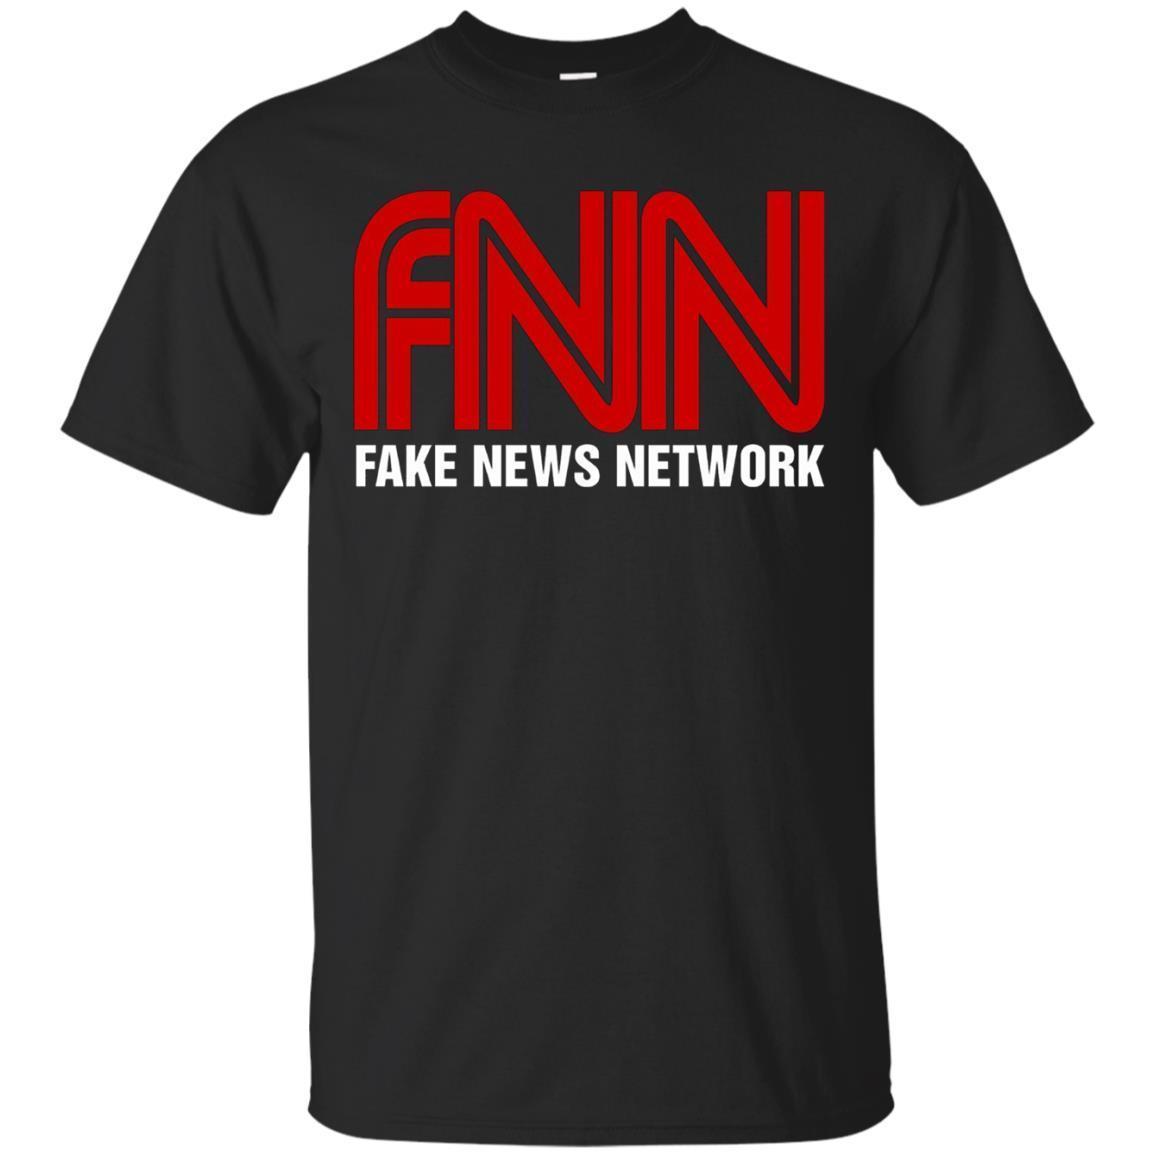 Fake News Network T-Shirt – Funny FNN Logo Humor Quote Tee